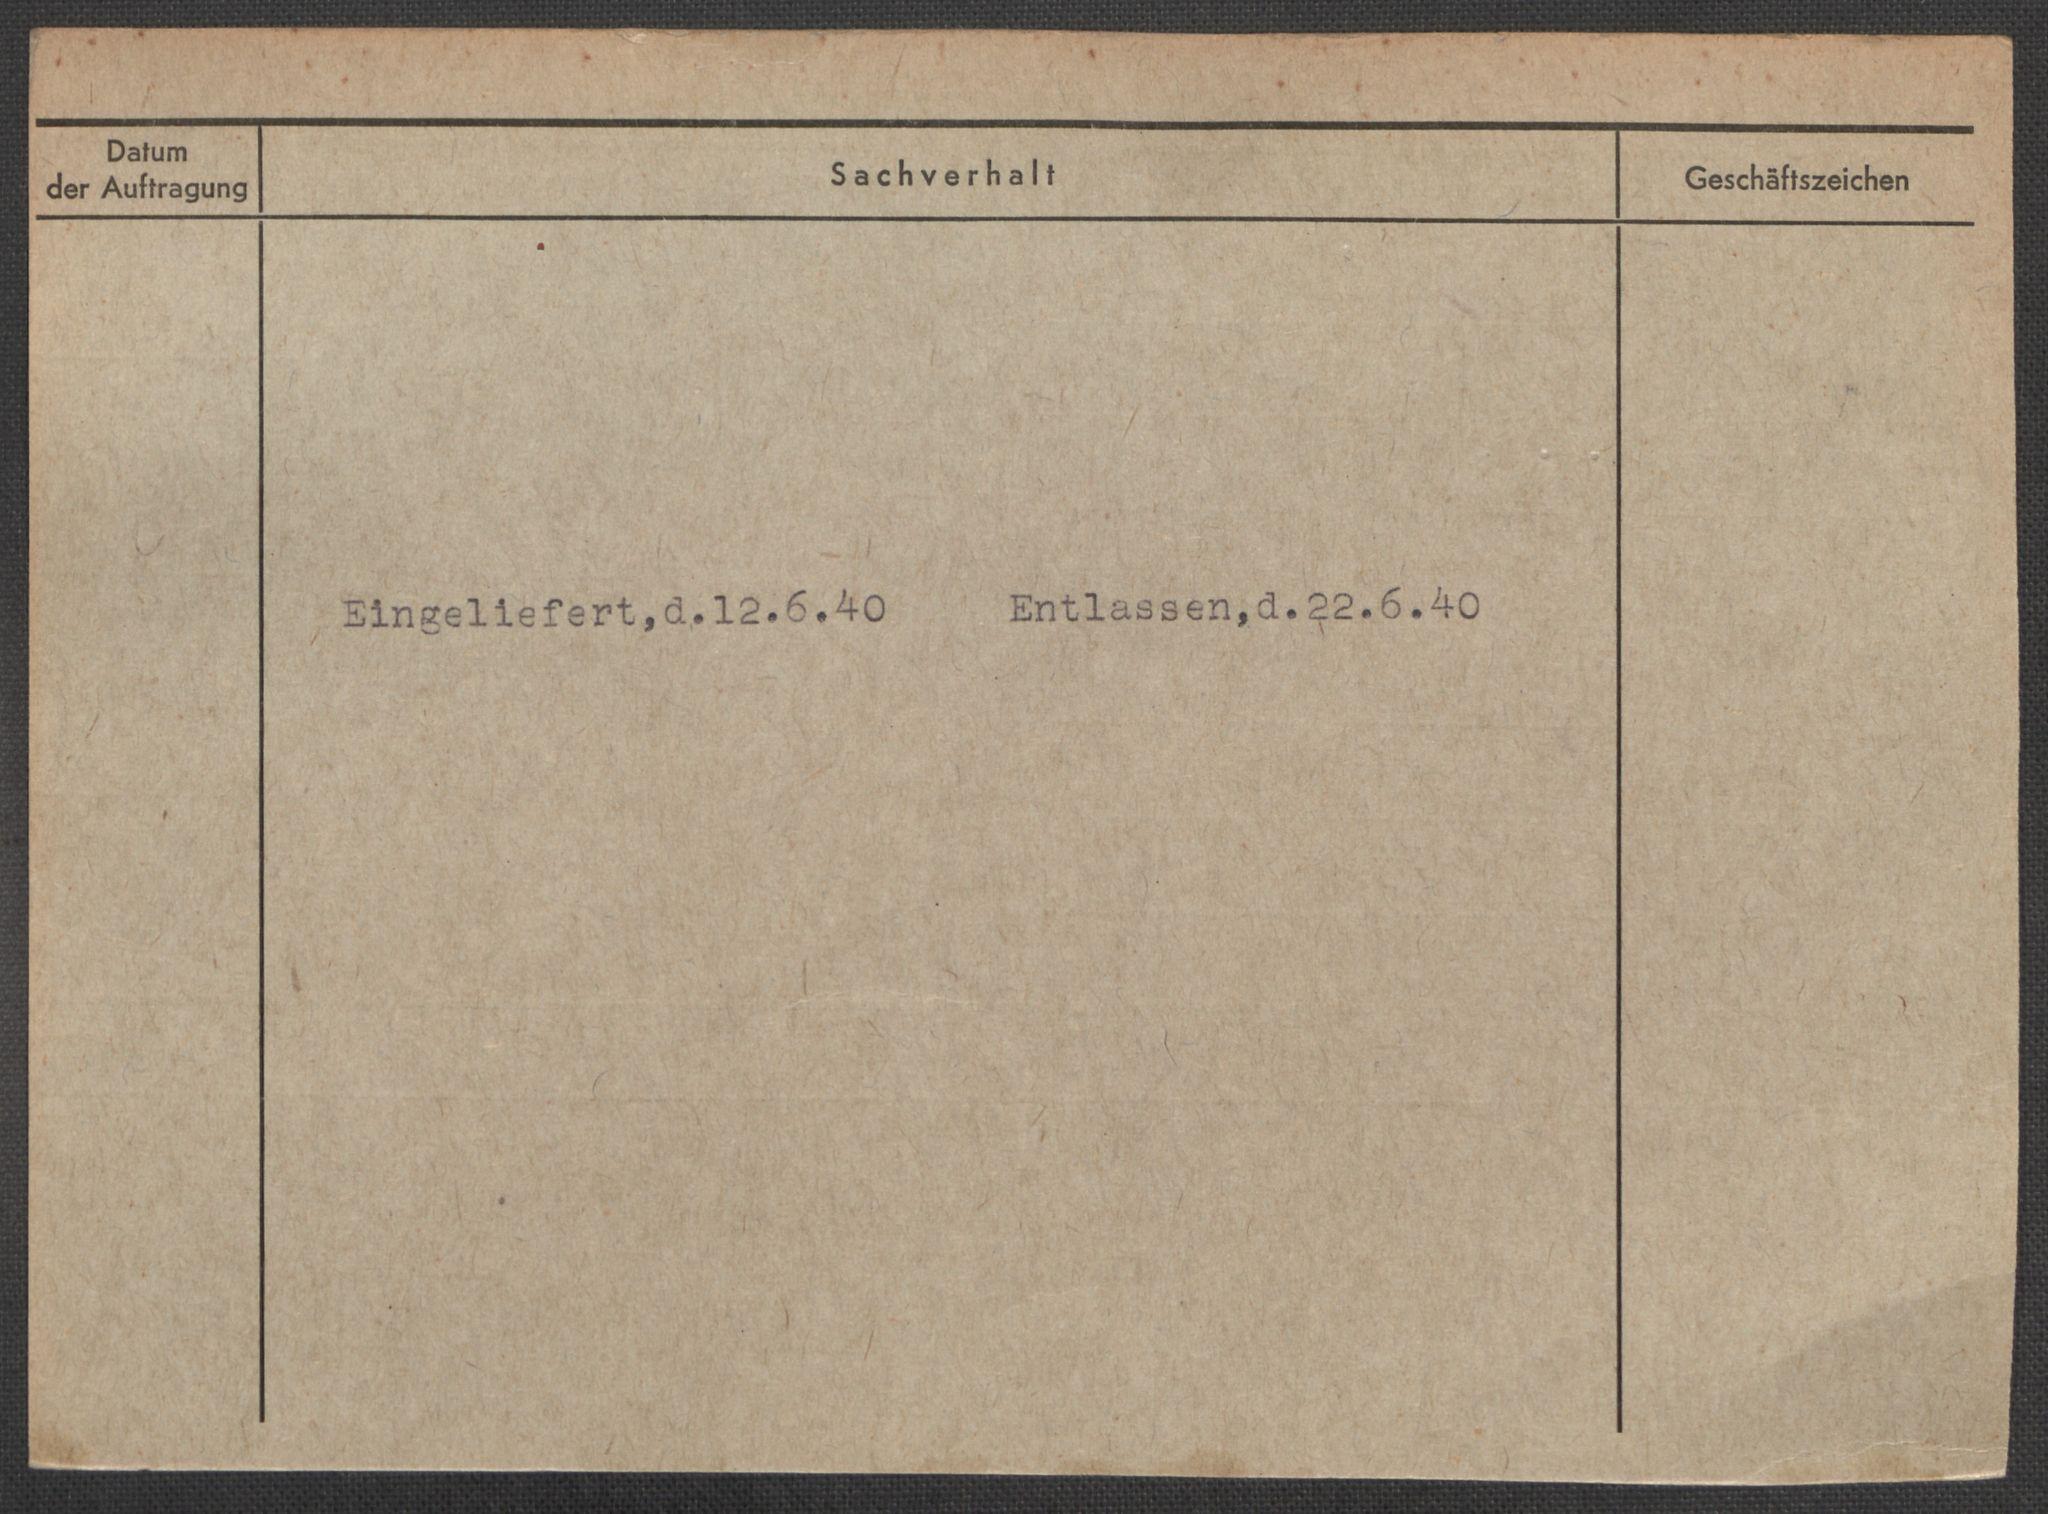 RA, Befehlshaber der Sicherheitspolizei und des SD, E/Ea/Eaa/L0007: Register over norske fanger i Møllergata 19: Lundb-N, 1940-1945, s. 847